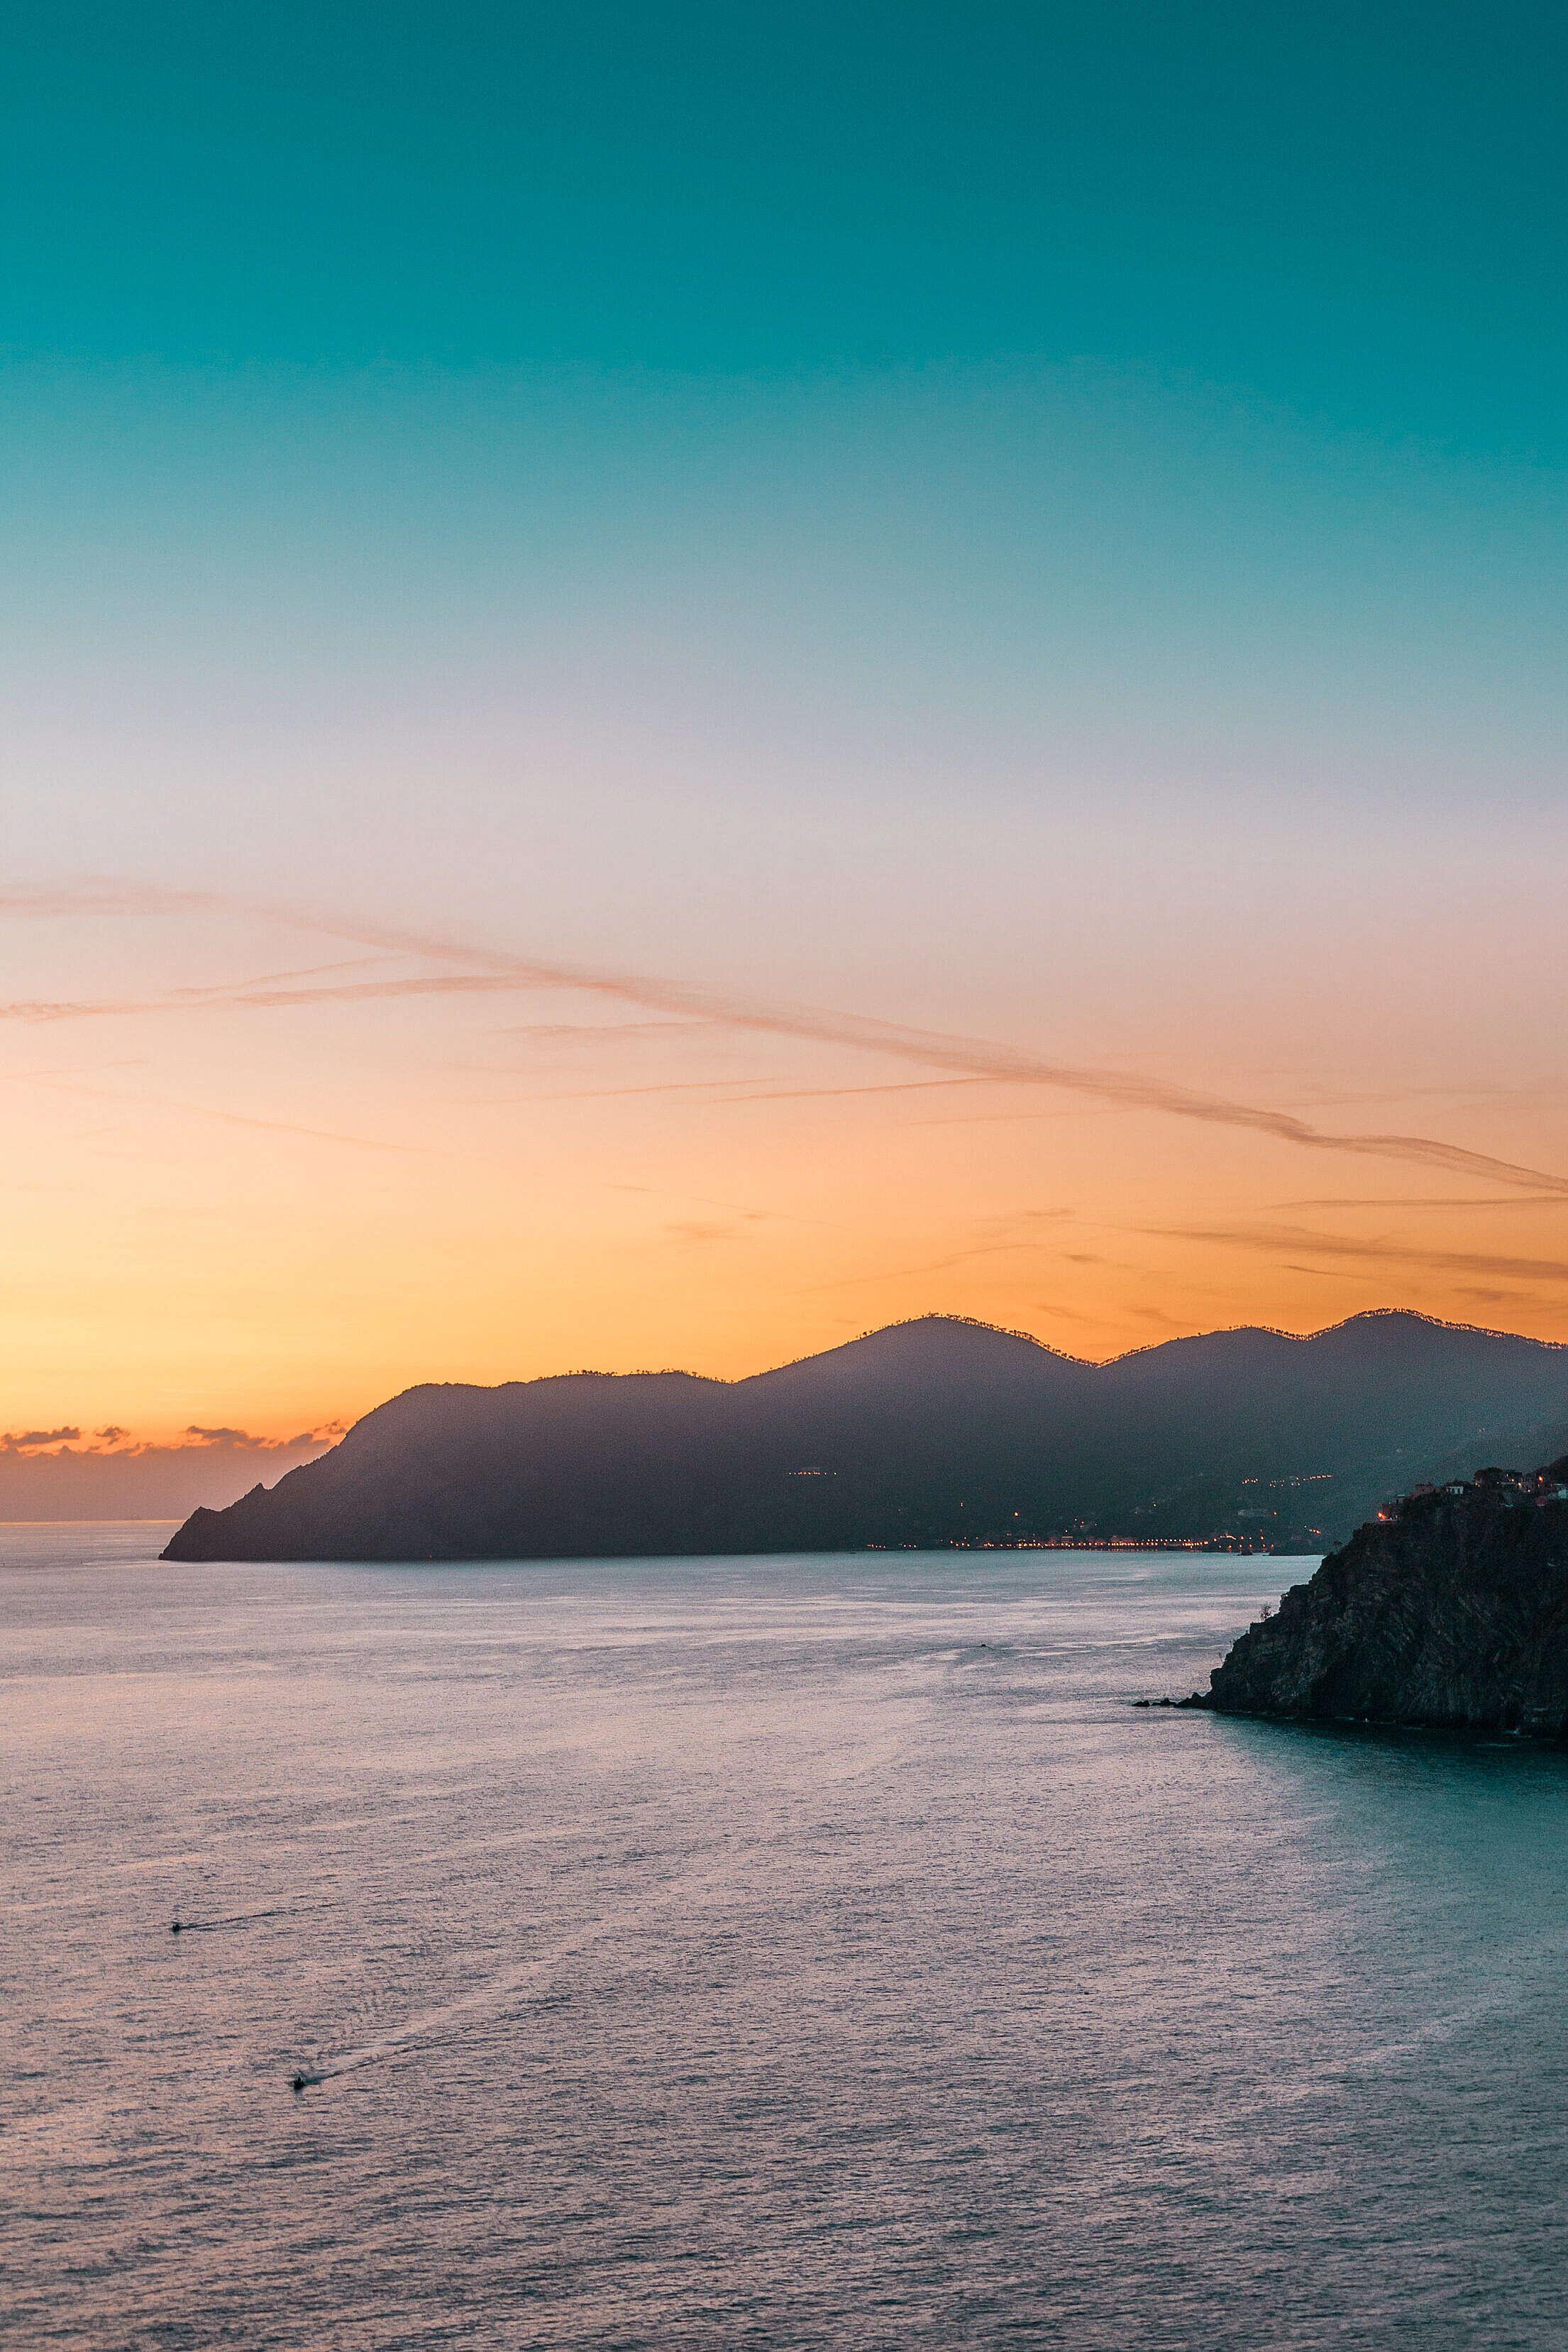 Italian Coastline in Sunset Free Stock Photo